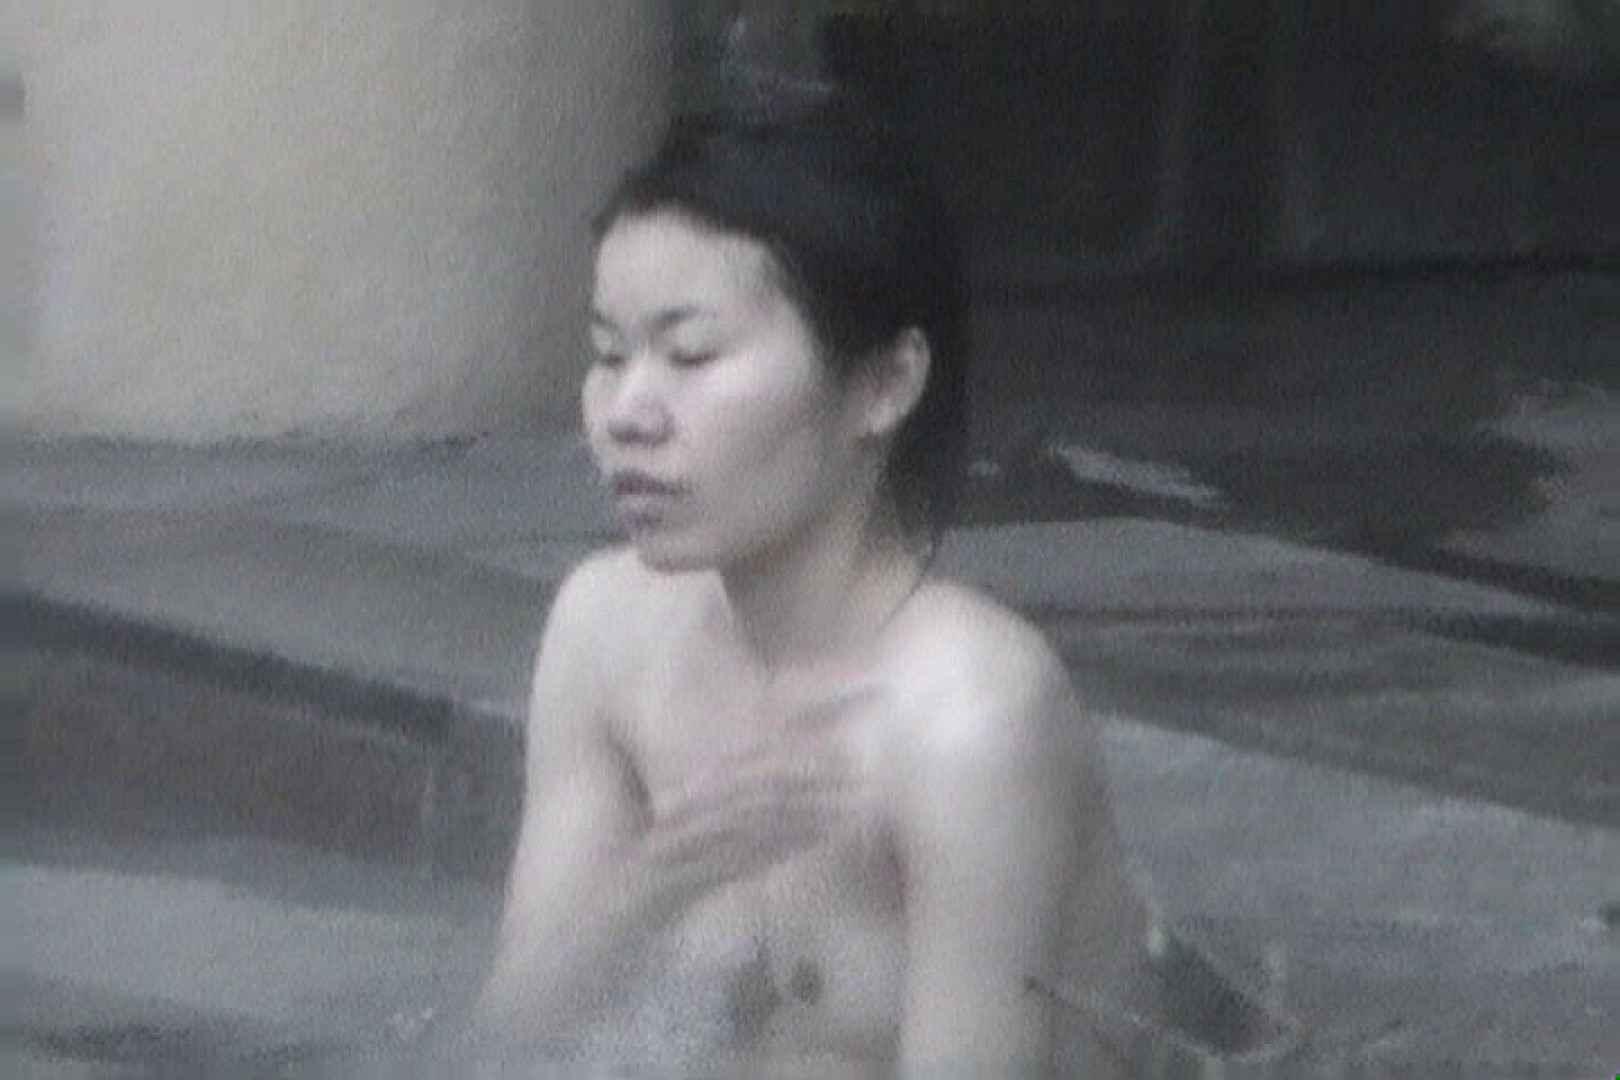 Aquaな露天風呂Vol.556 露天風呂編 | 盗撮シリーズ  99PIX 67